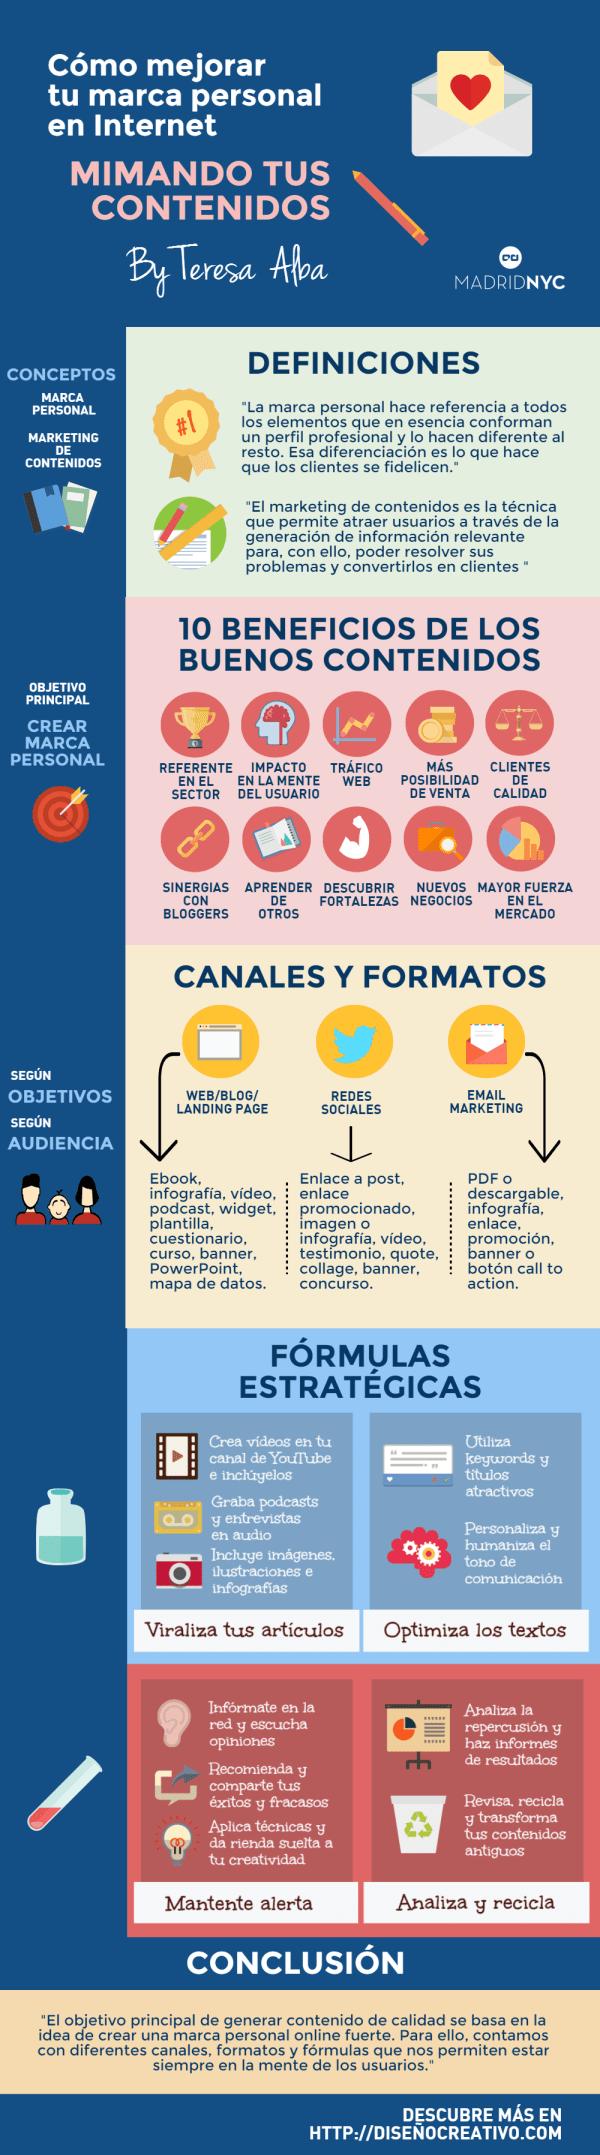 crear-marca-personal-online-infografia-Teresa-Alba-MadridNYC